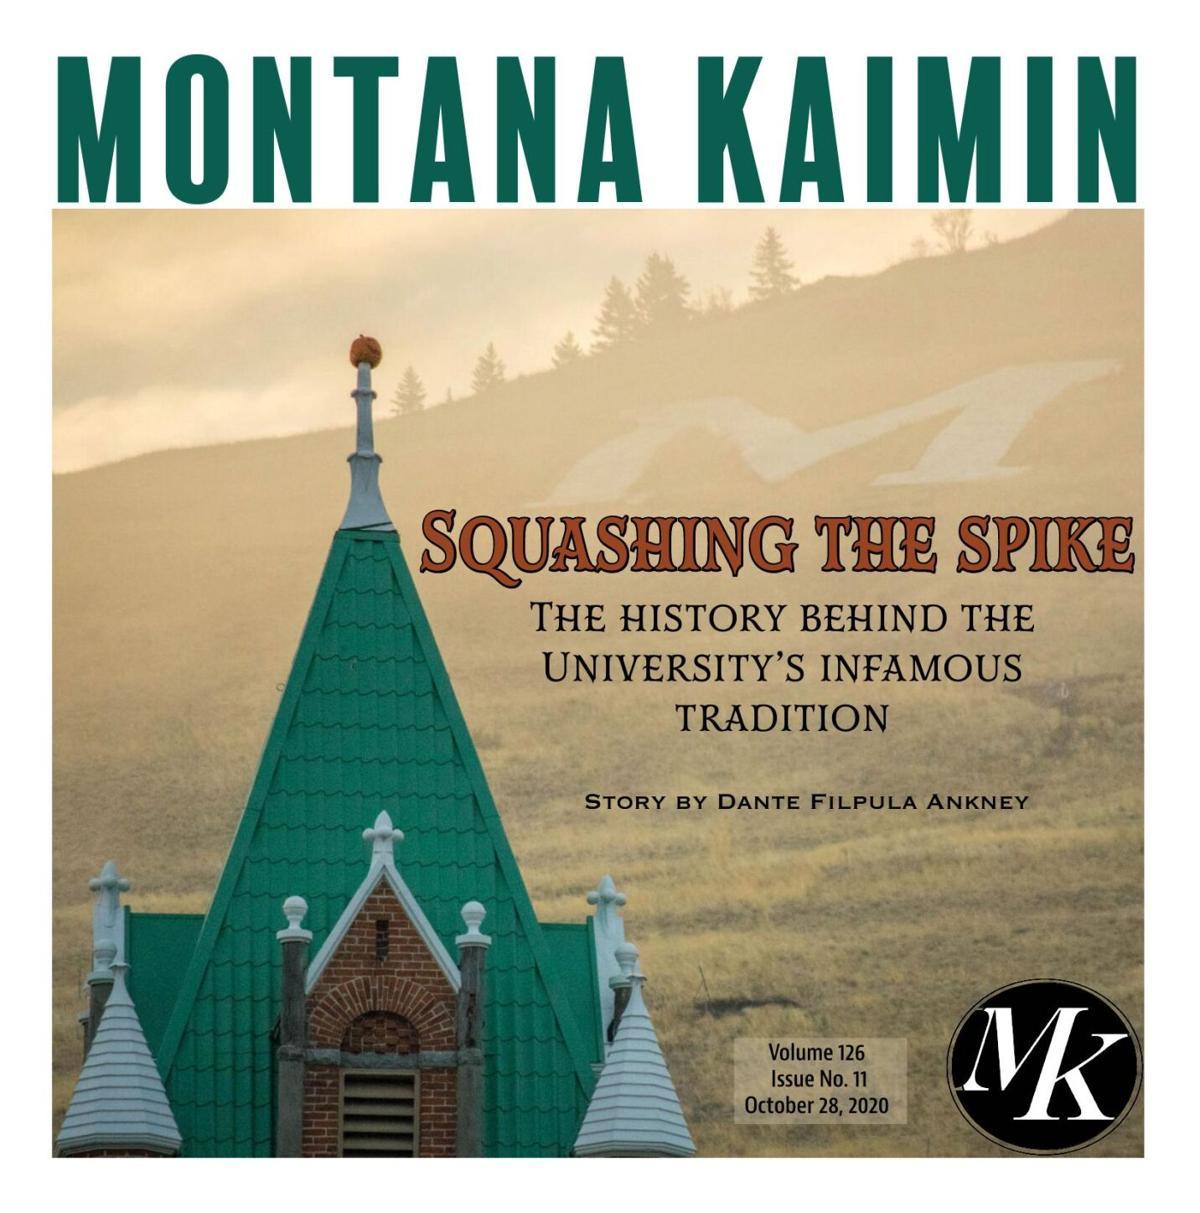 Montana Kaimin   Vol 123 Issue no. 011 10.28.2020 (copy)